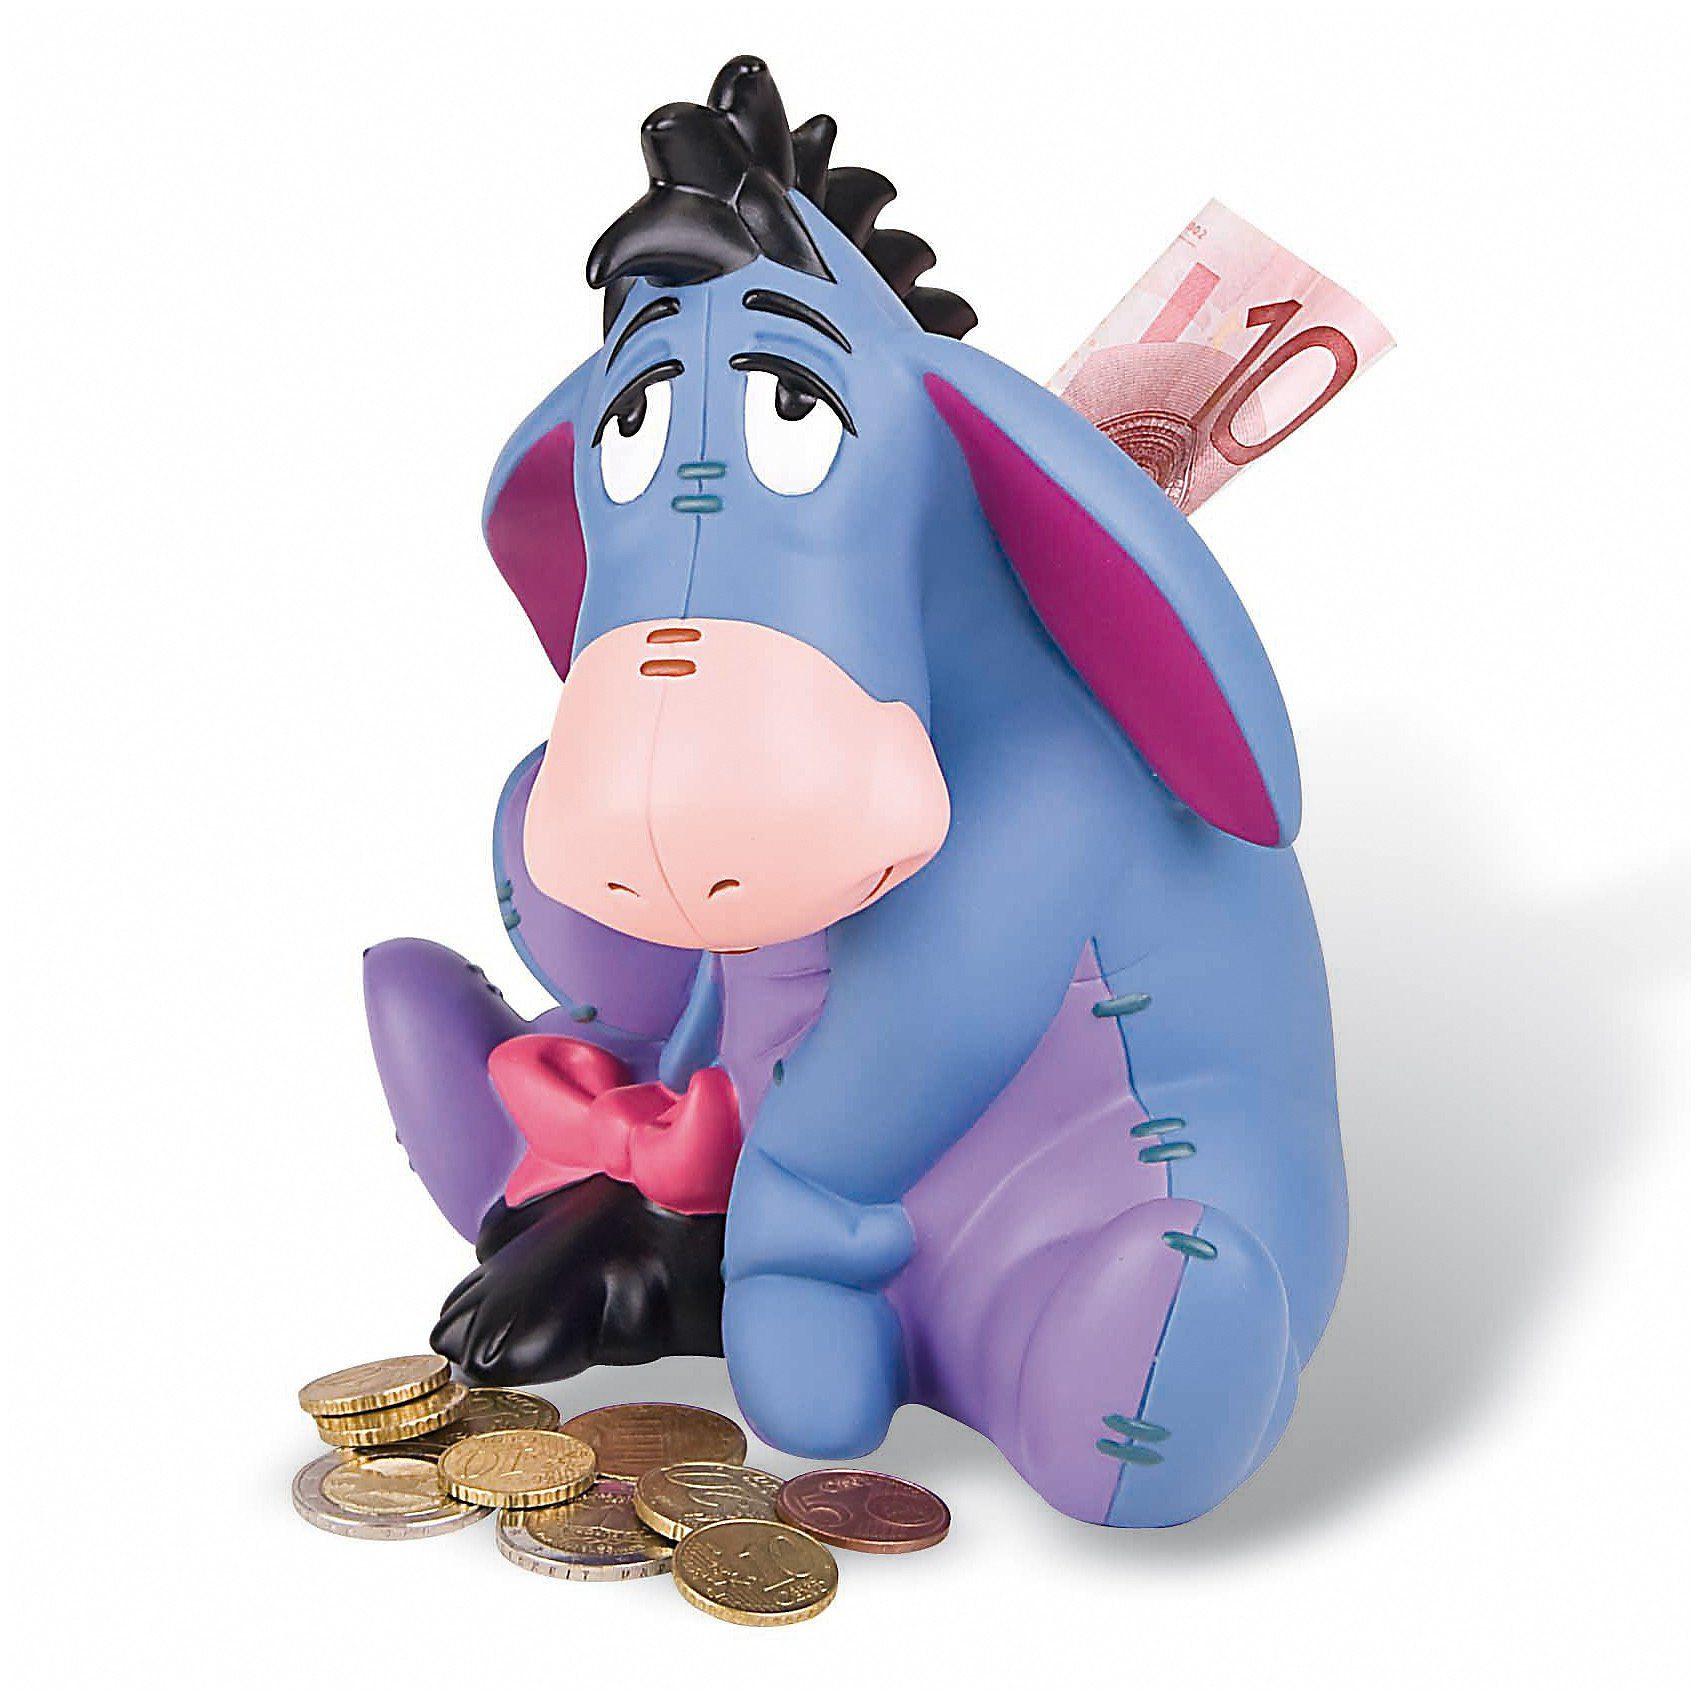 BULLYLAND Spardose Walt Disney Winnie the Pooh - I-aah